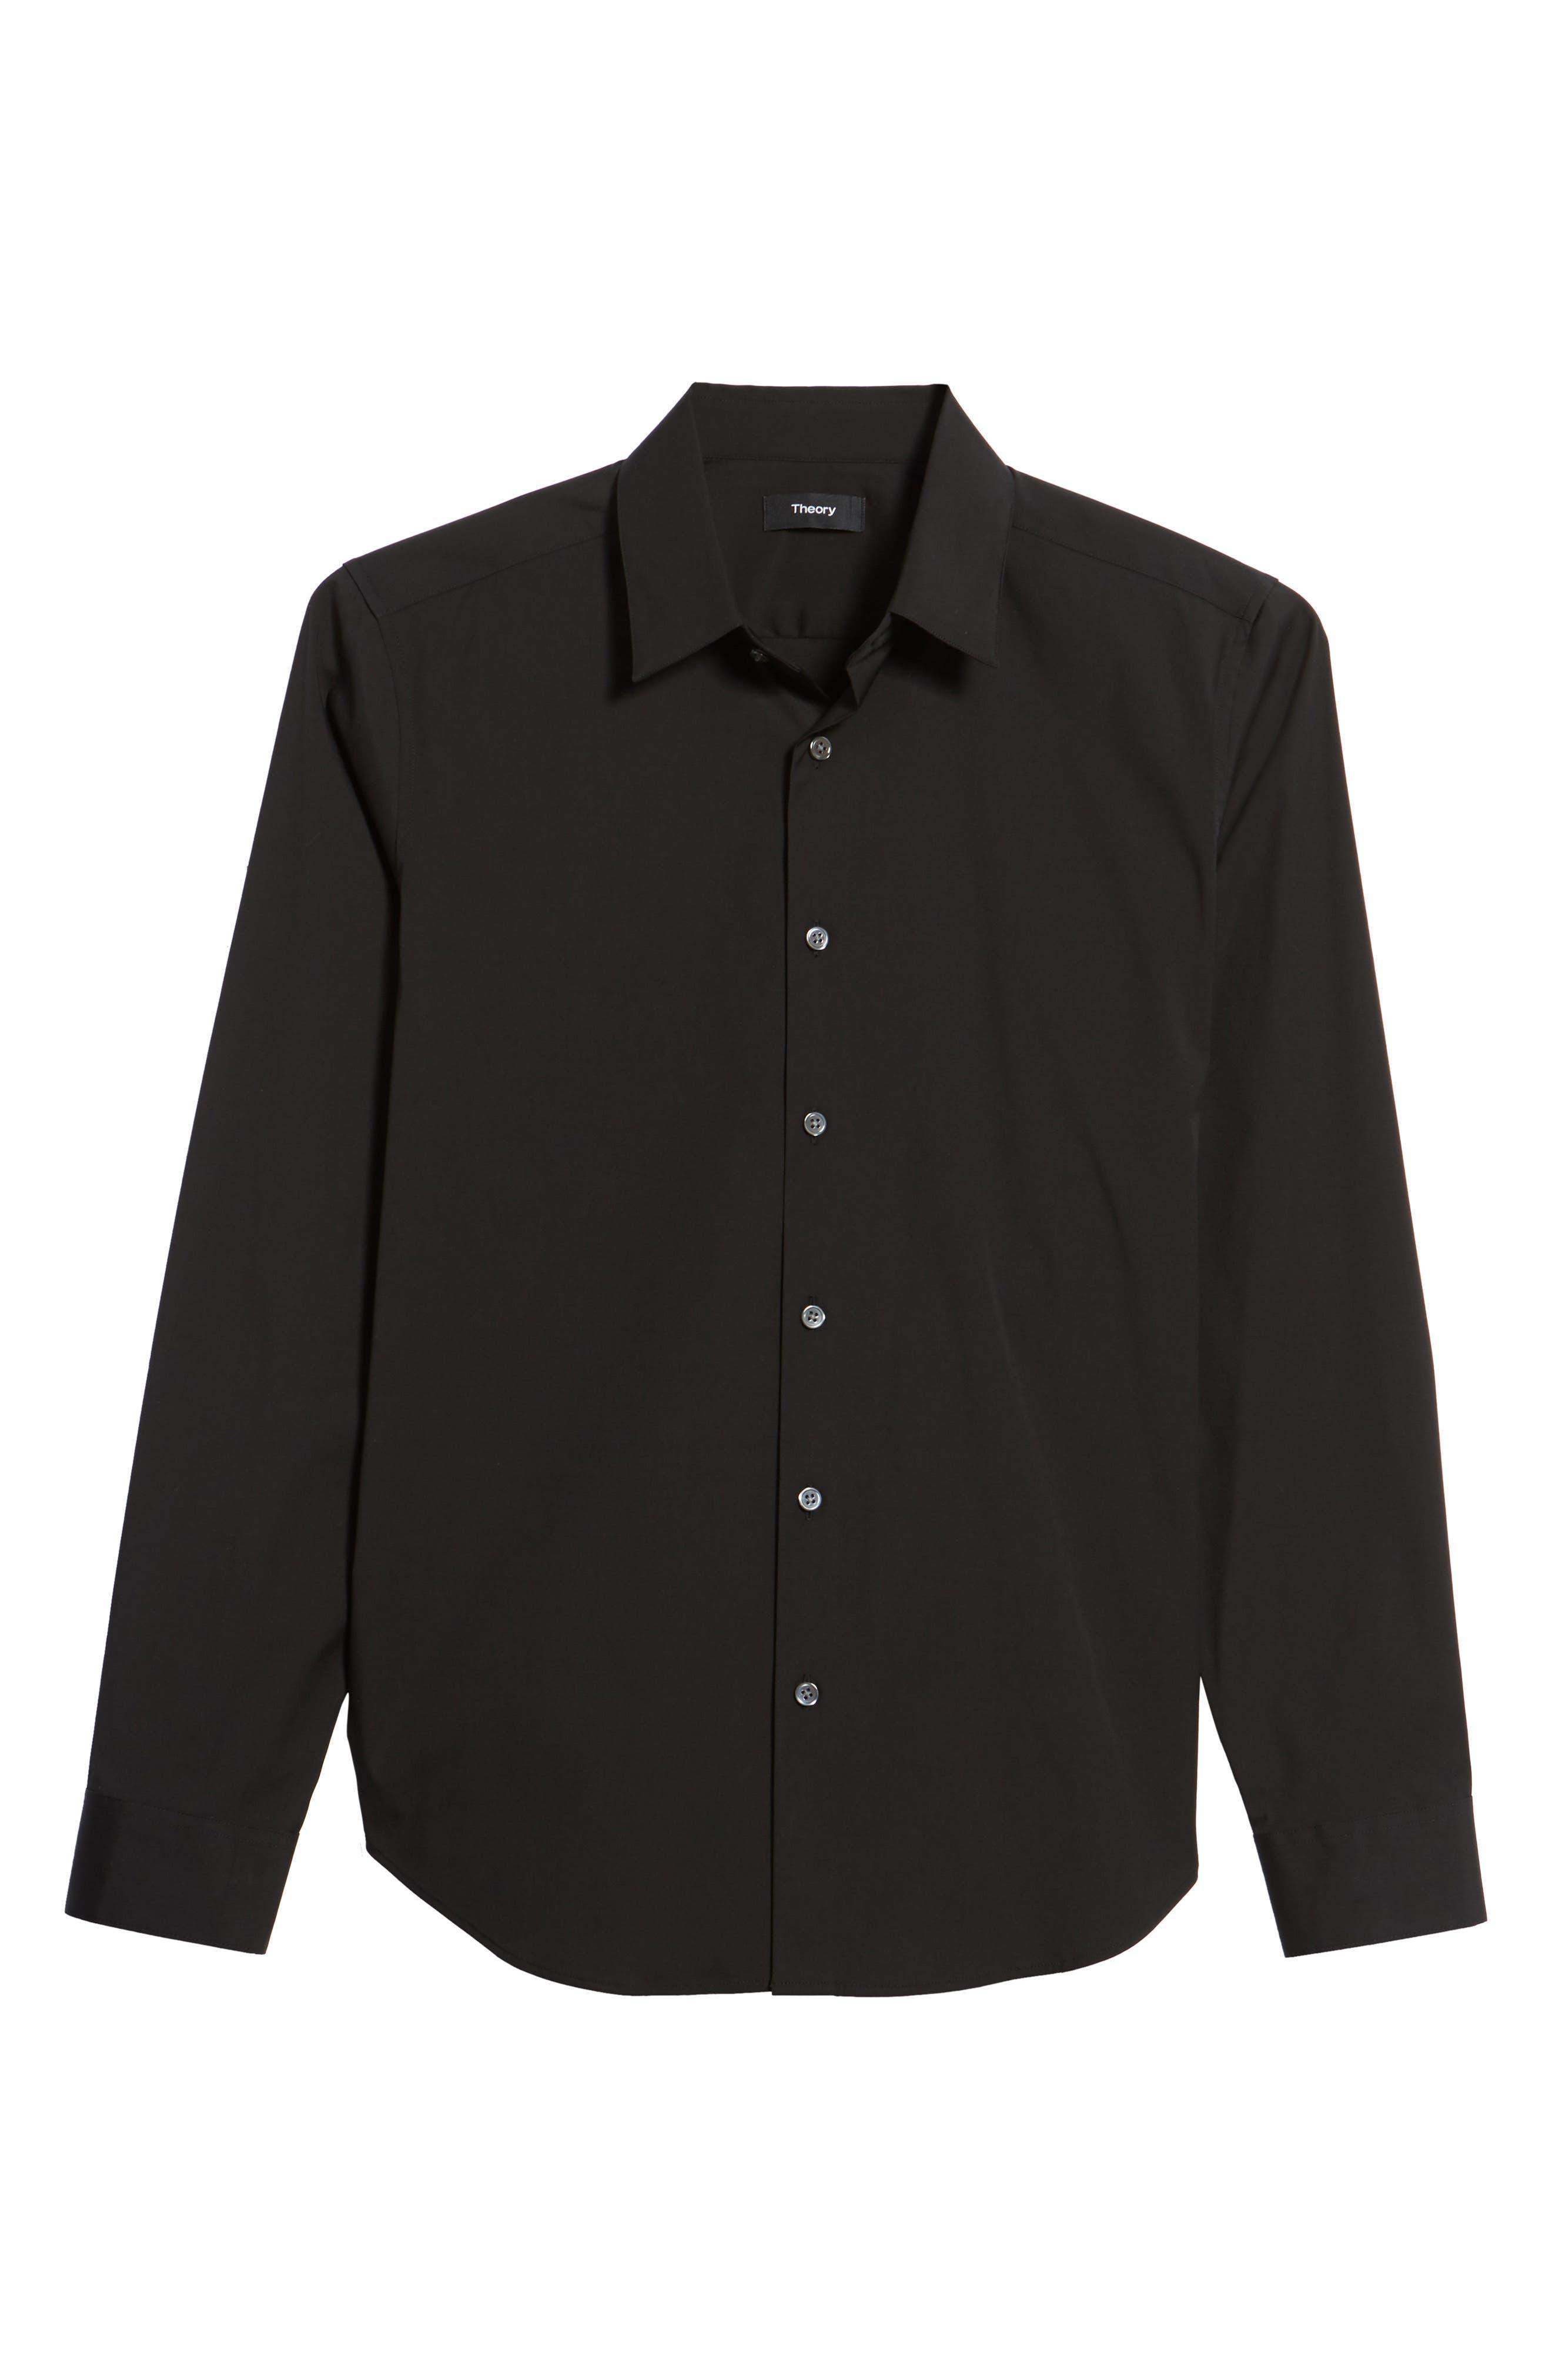 THEORY 'Sylvain' Trim Fit Long Sleeve Sport Shirt, Main, color, BLACK